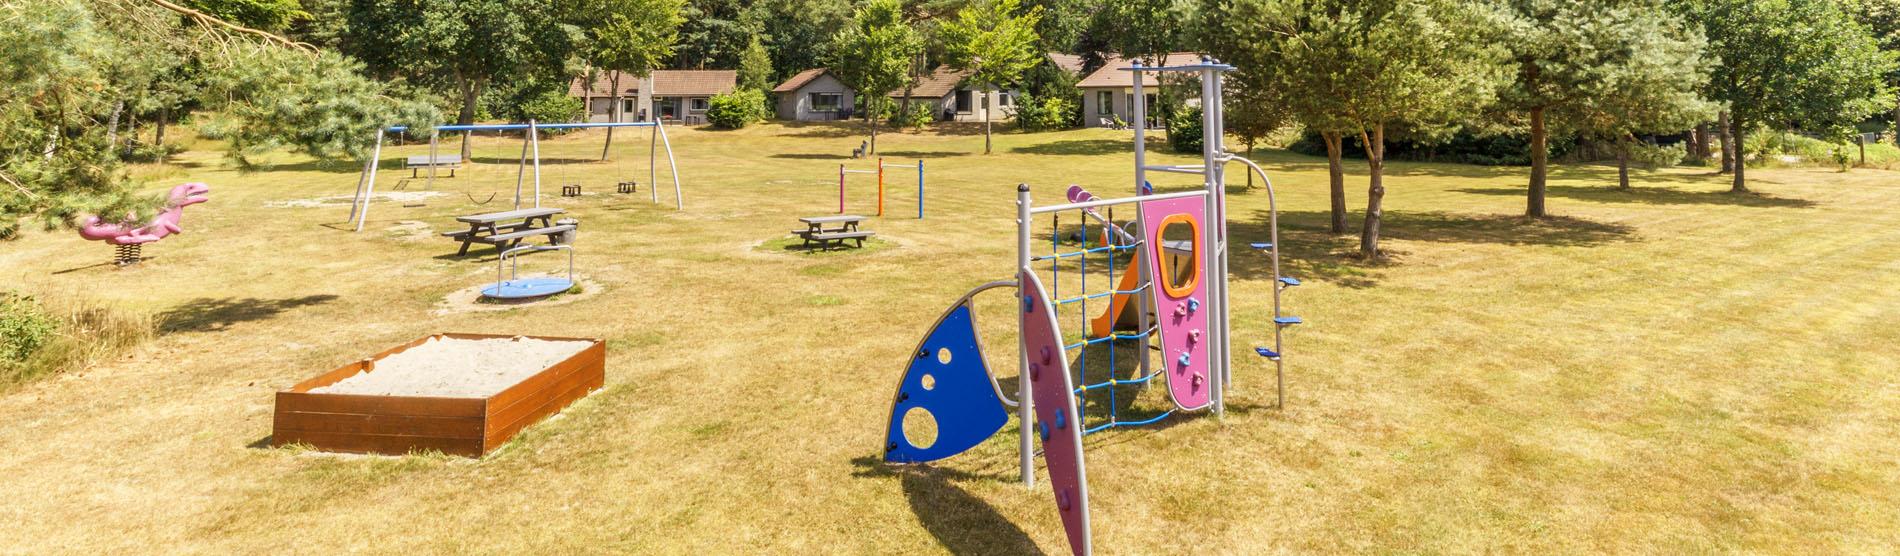 De-Rietberg-bungalowpark-speelveld